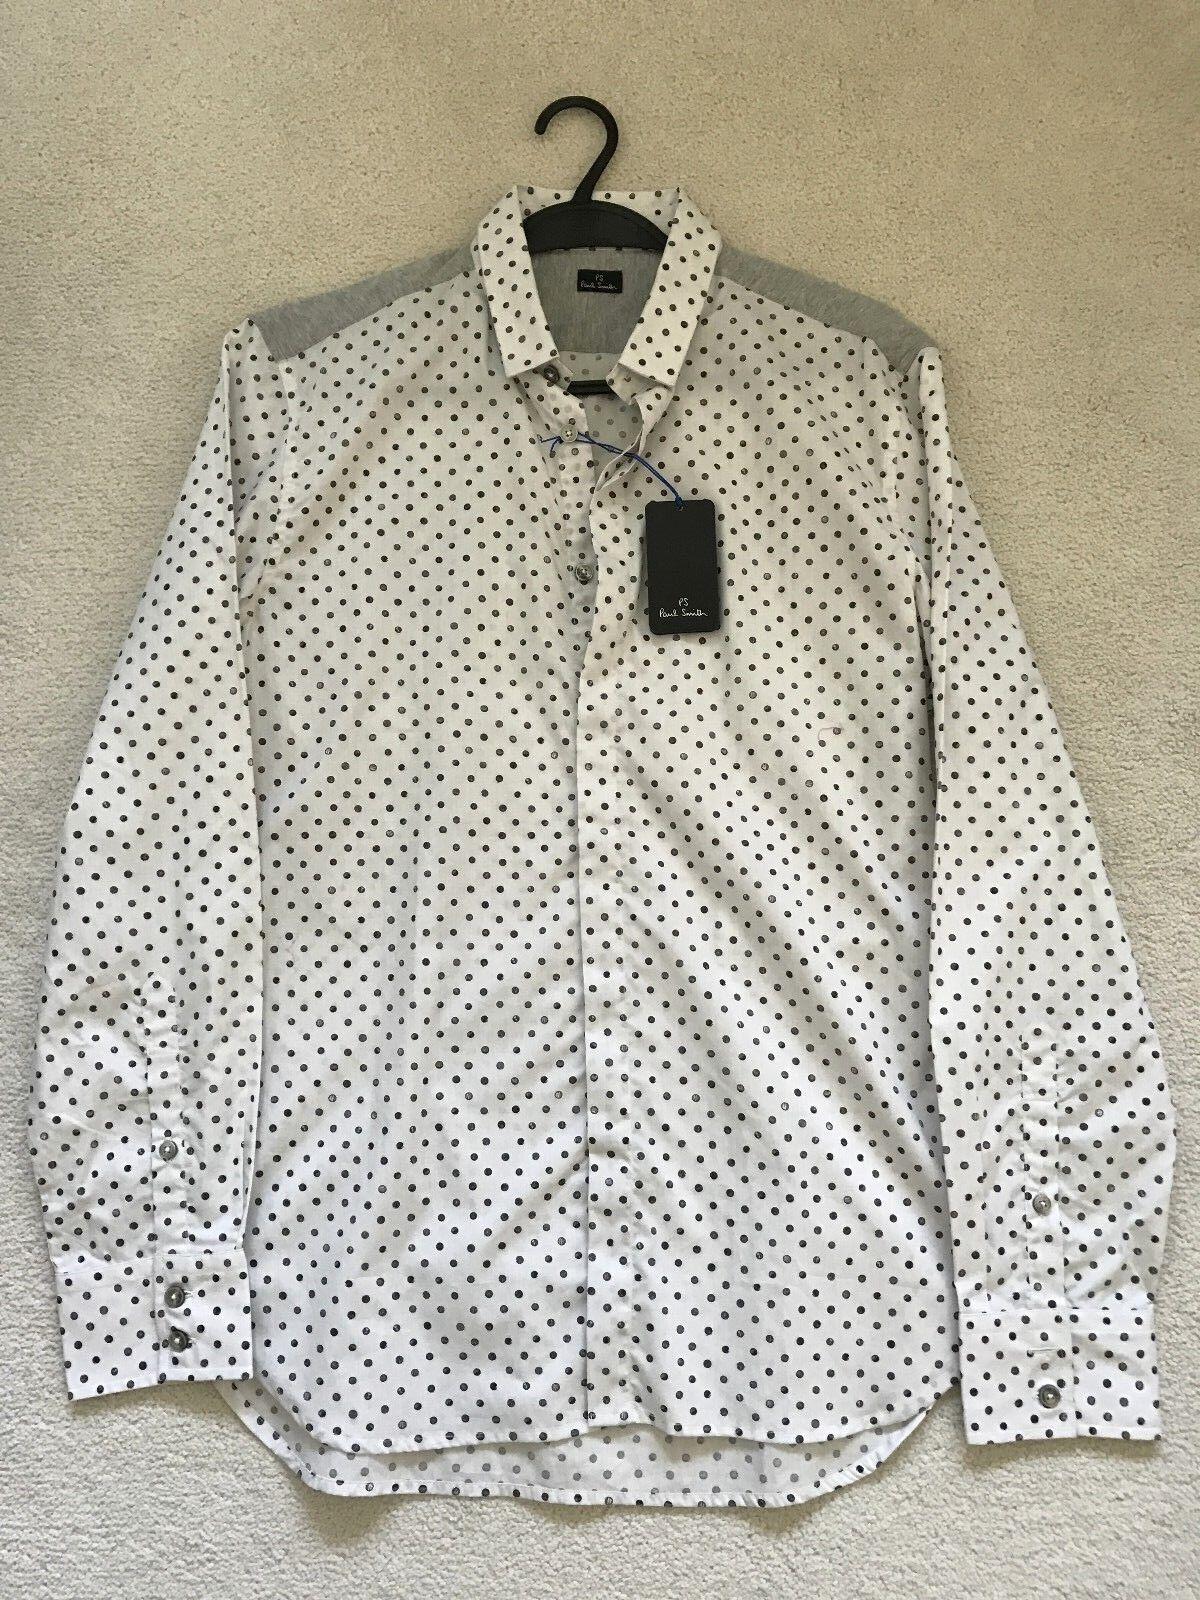 Paul Smith PS  Long Sleeve Circle Graphics Casual Shirt  - M -  p2p 20